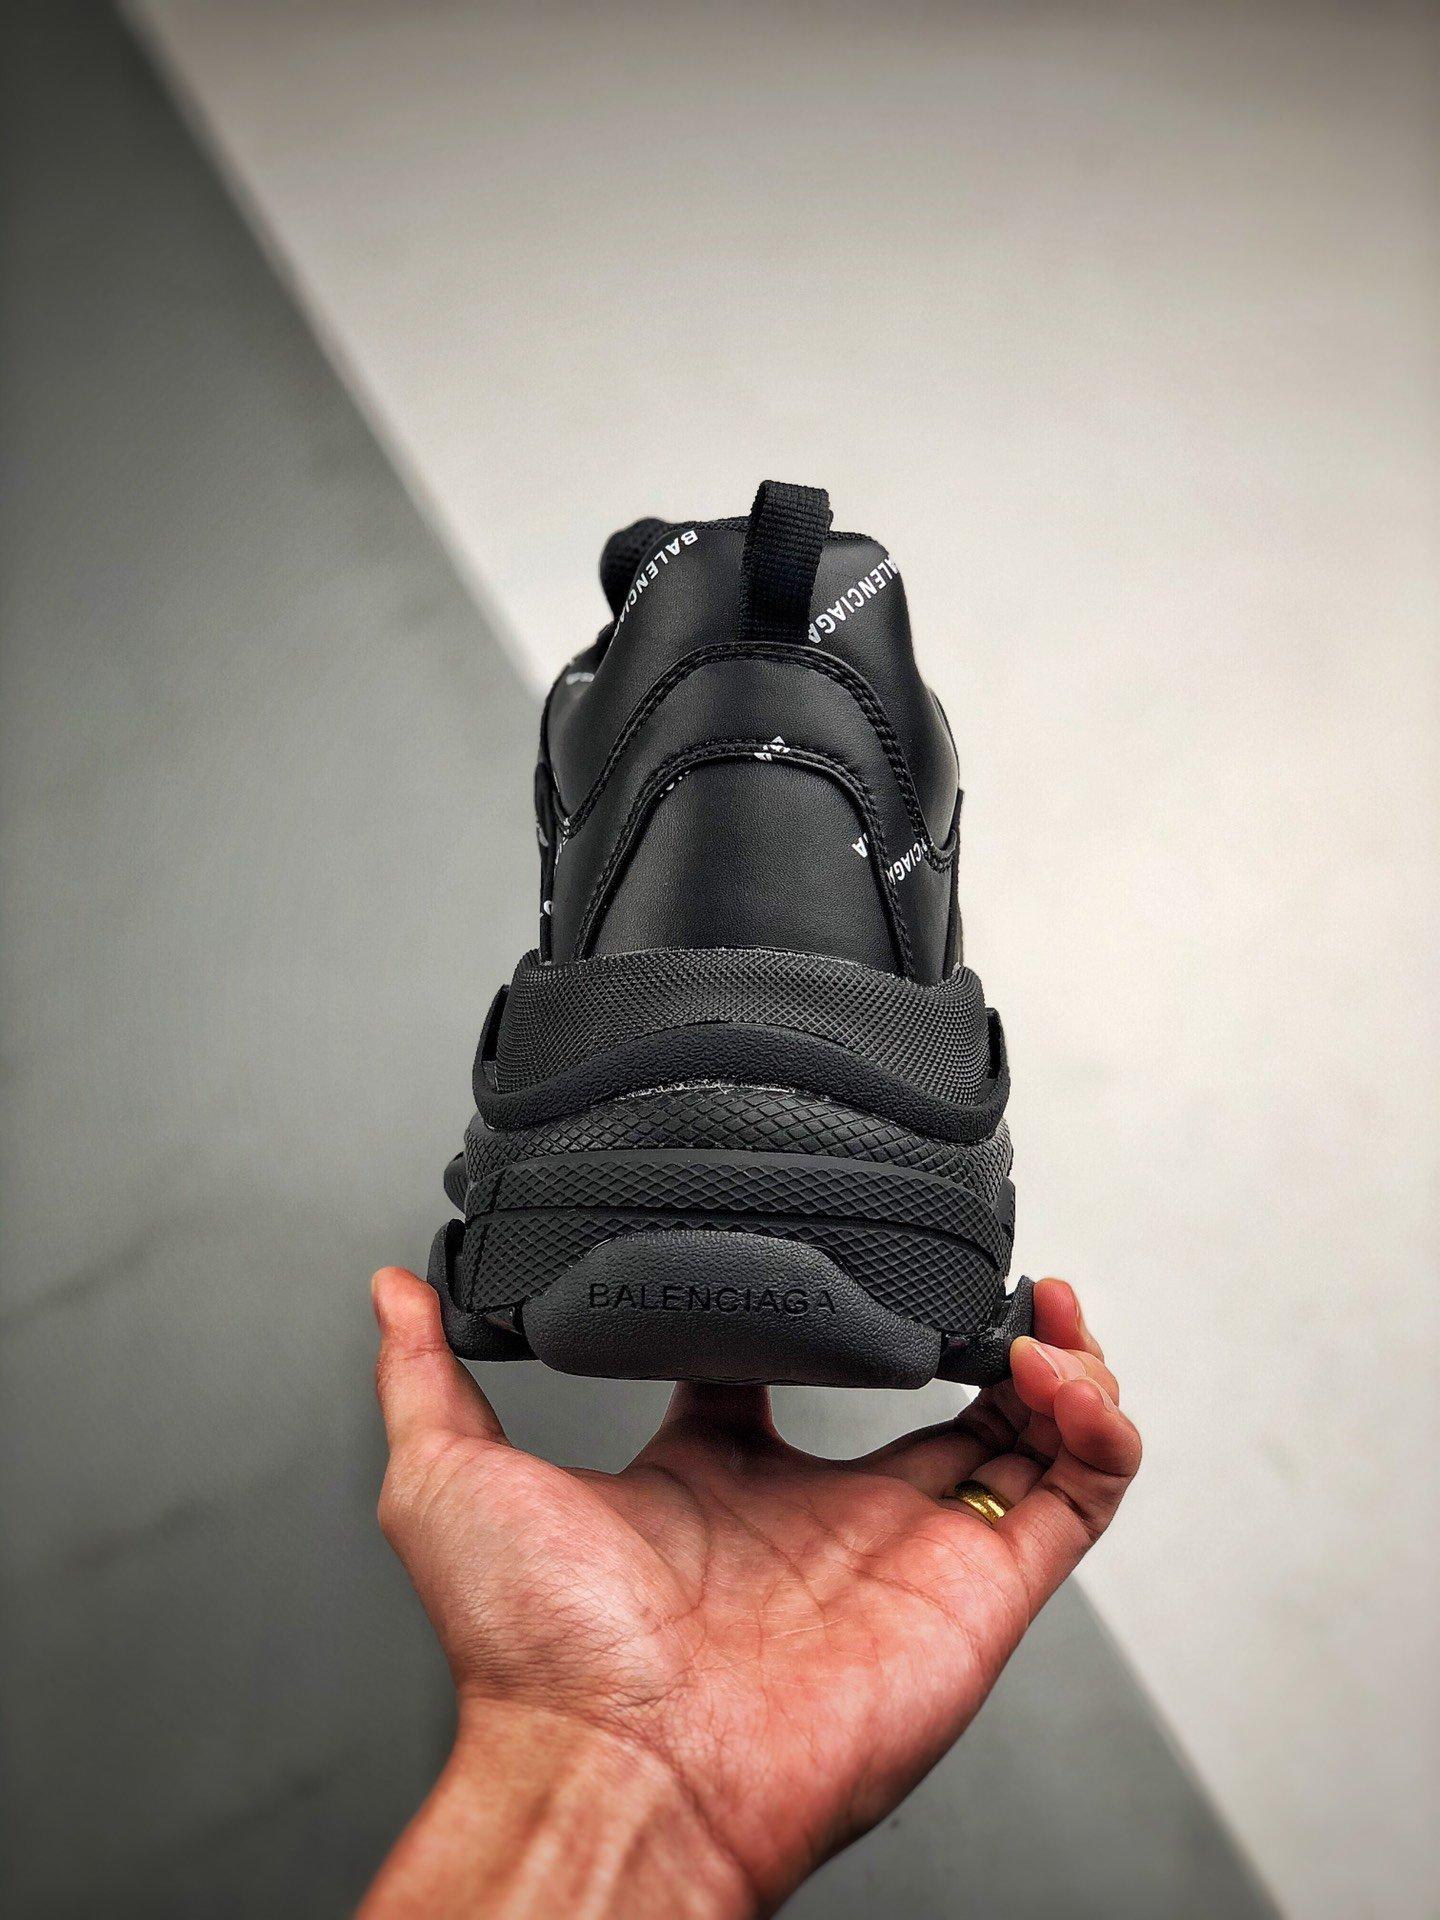 Balenciaga Triple S 纯黑弹幕_莆田鞋h12和og哪个好